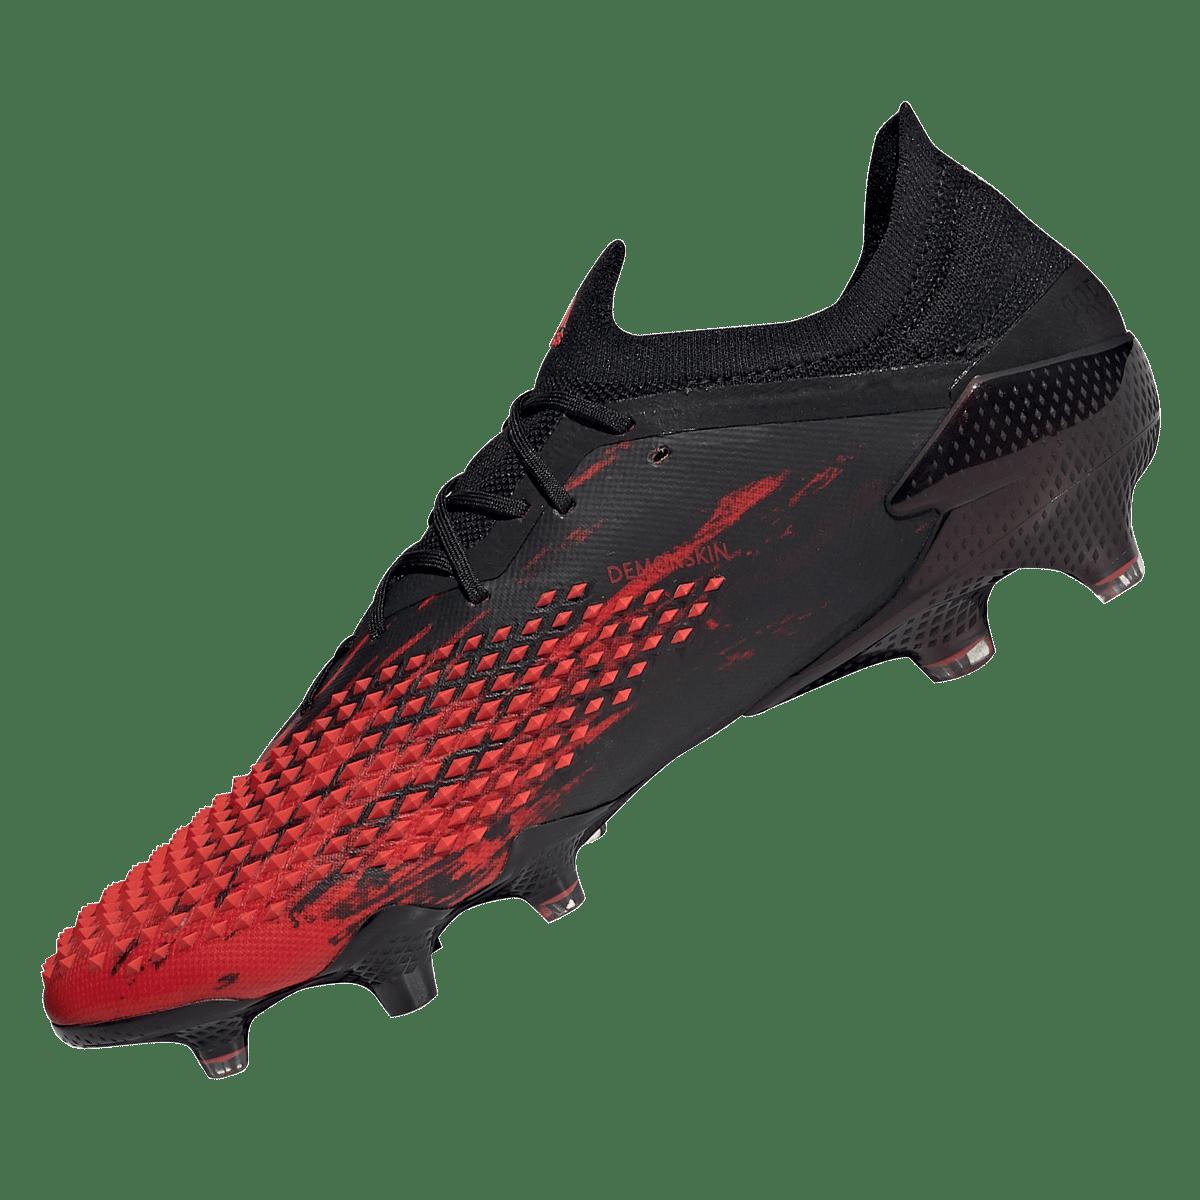 adidas Predator Mutator 20+ Firm Ground Soccer Cleats Junior